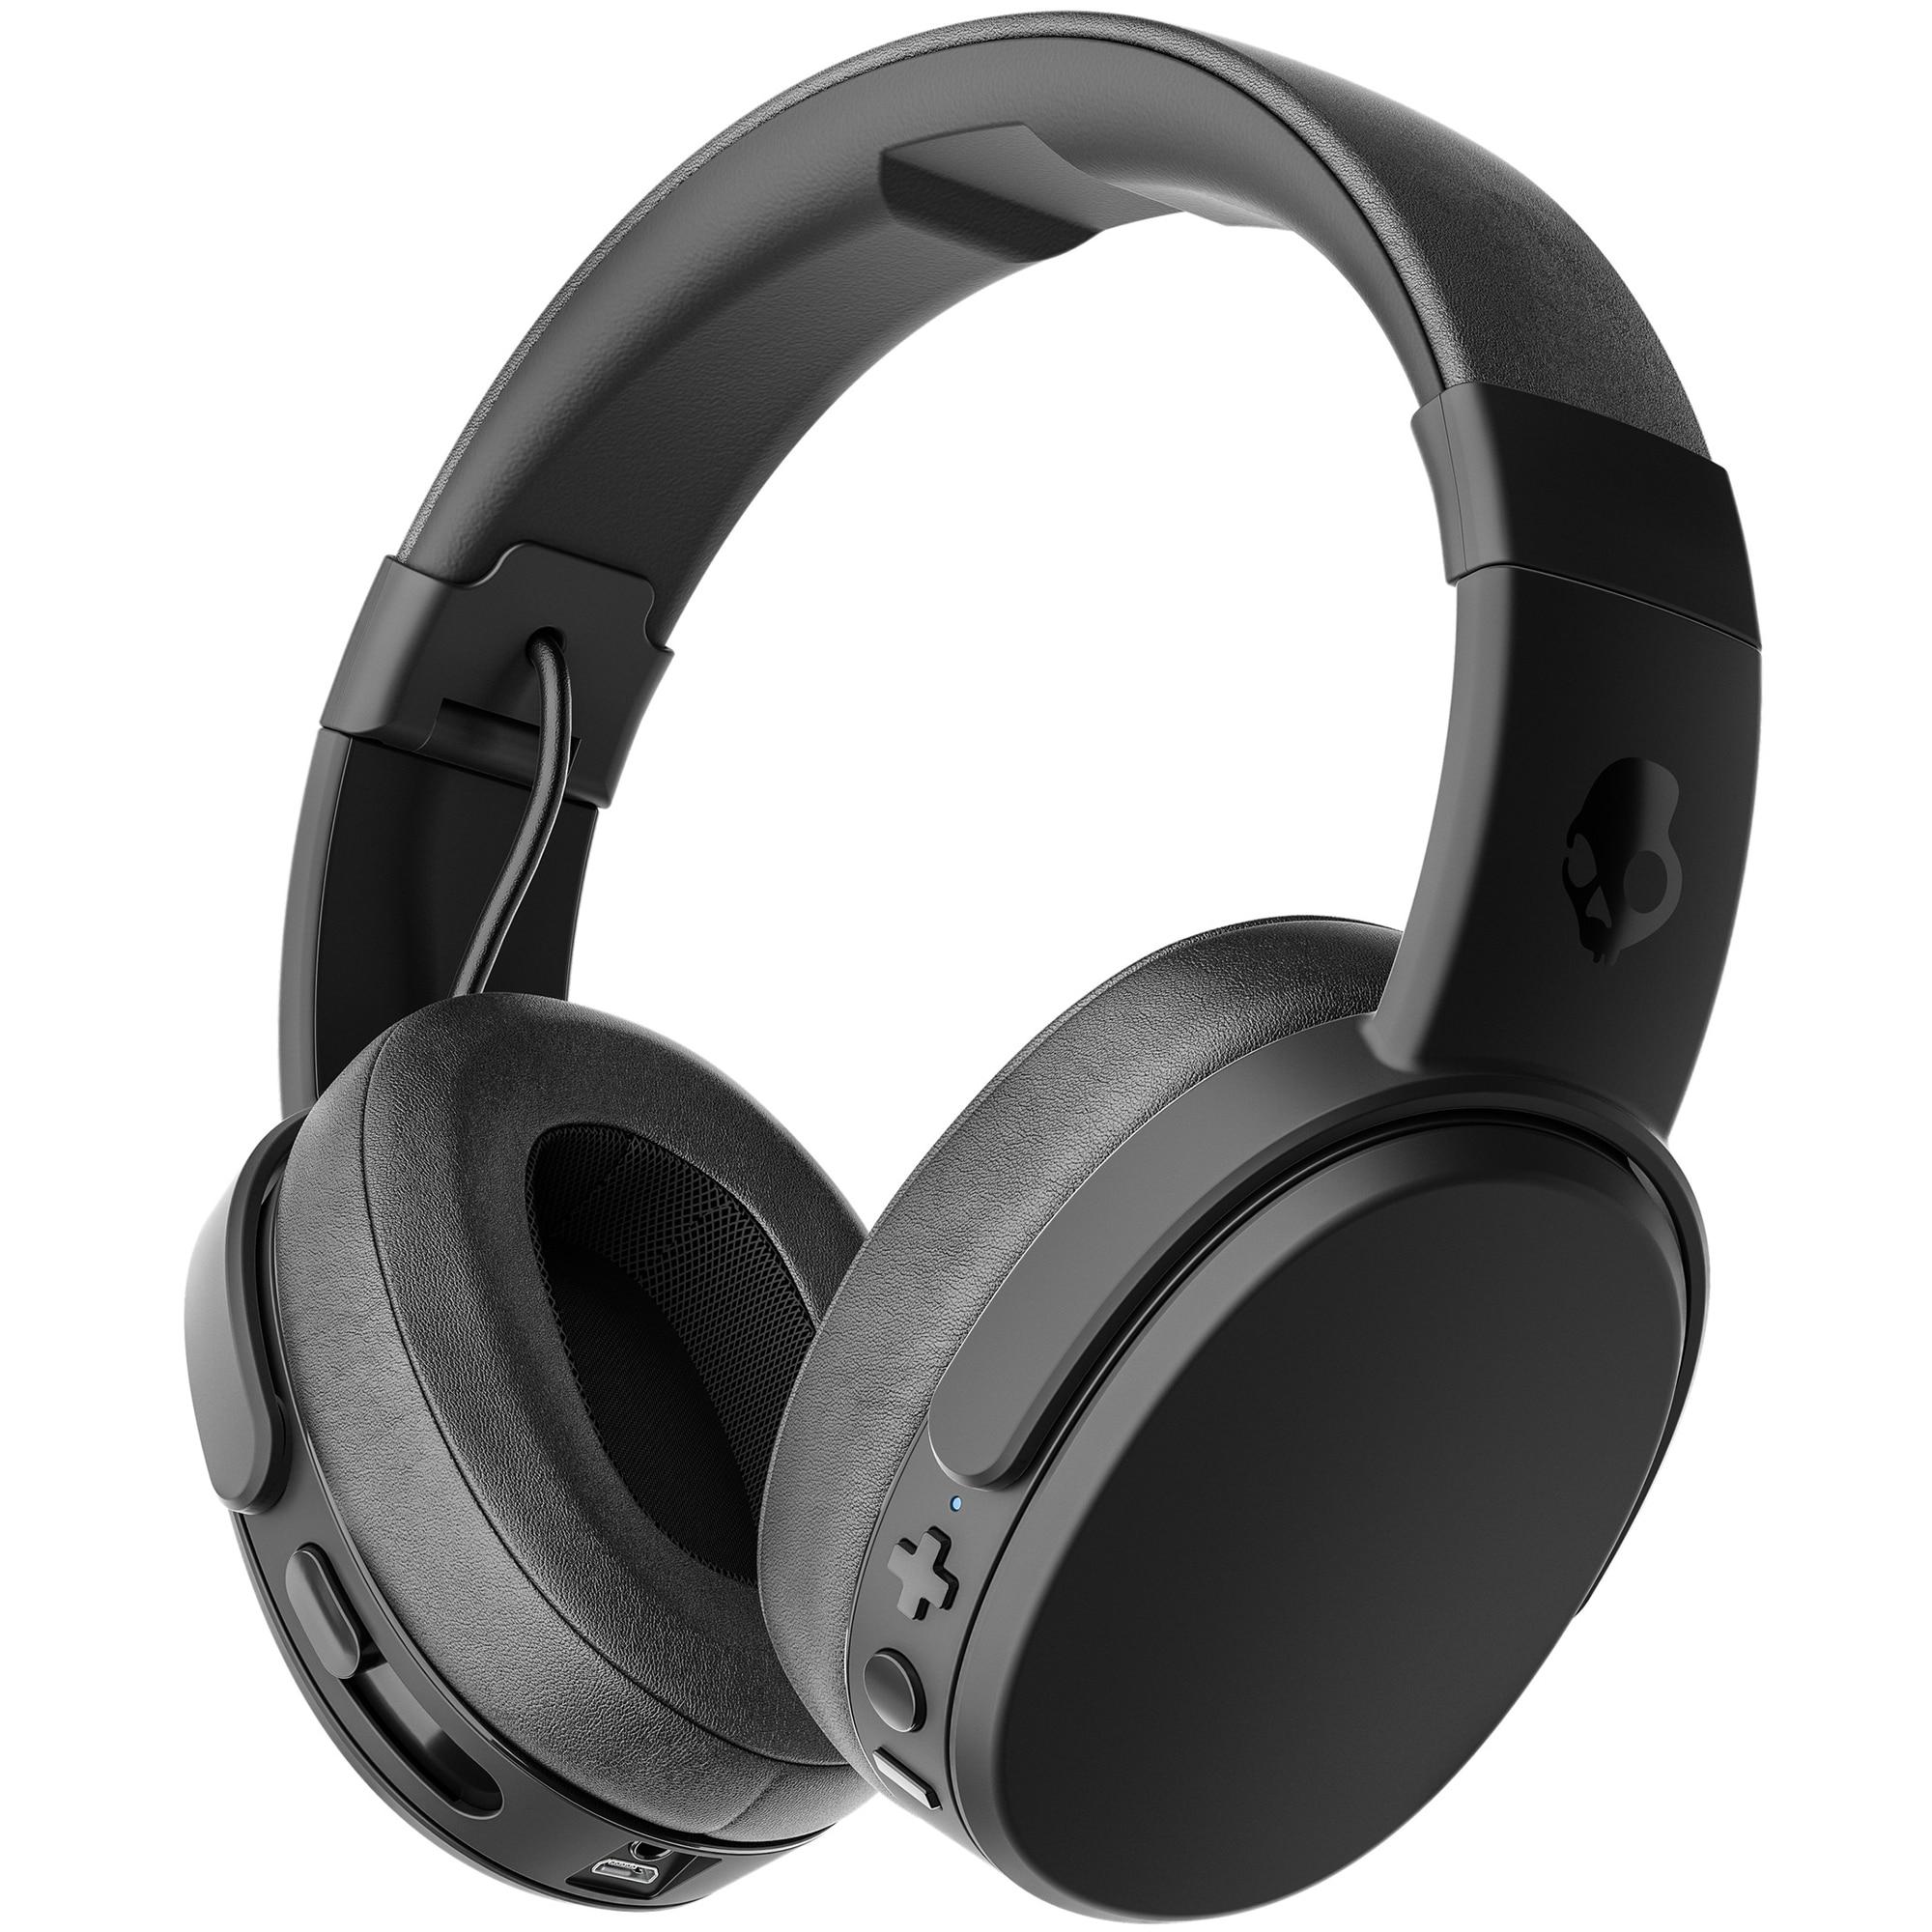 Fotografie Casti Audio Over the ear Pliabile Skullcandy S6CRW-K591, Wireless, Bluetooth, Functie Bass, Microfon, Autonomie 40 ore, Coral Black